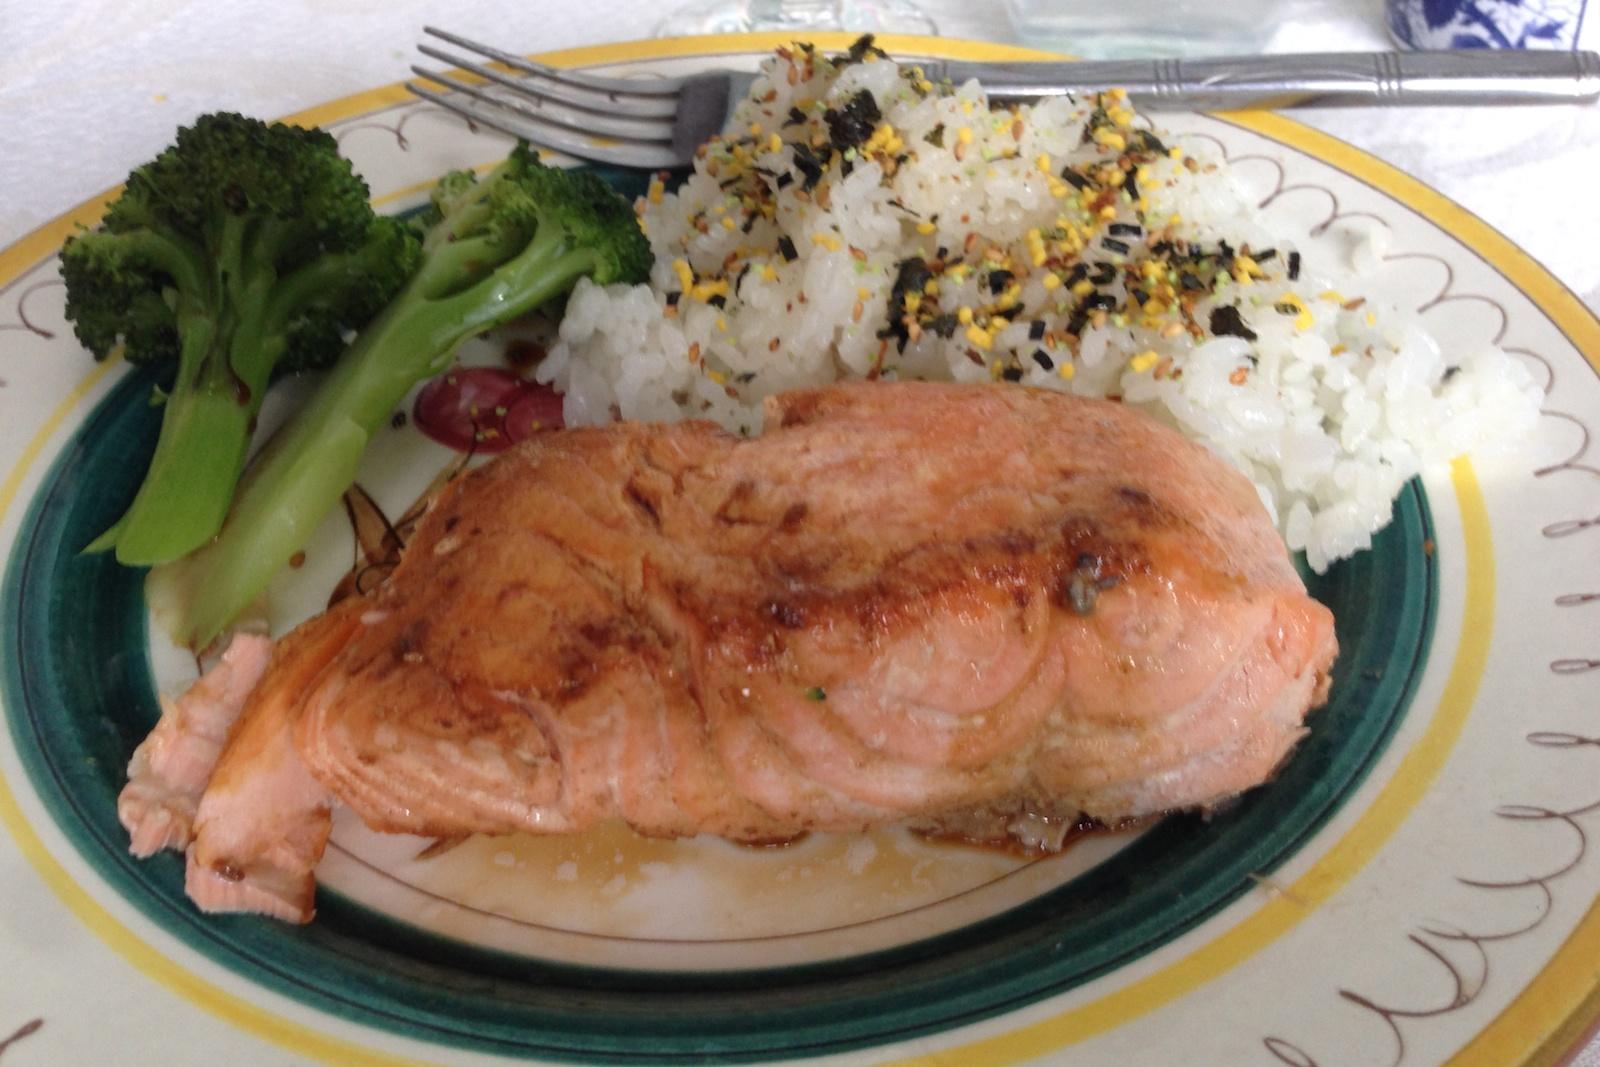 http://blog.rickk.com/food/2014/04/16/ate.2014.04.16.l.jpg